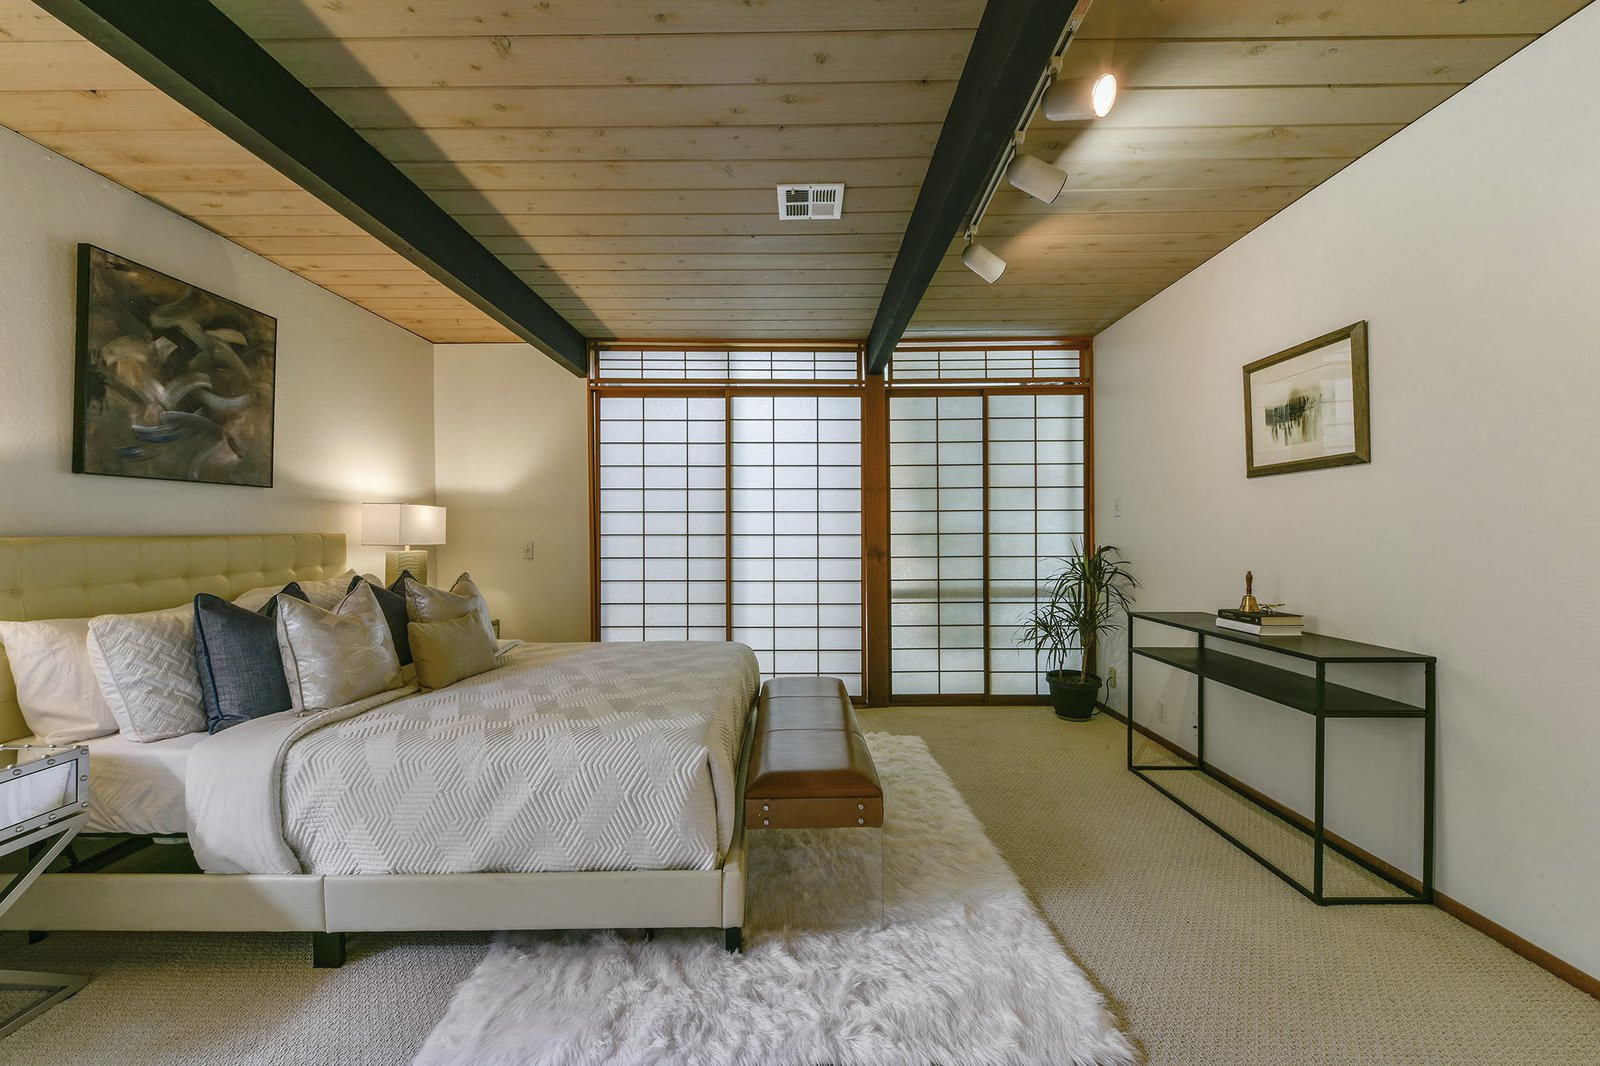 Gallery Eichler master bedroom